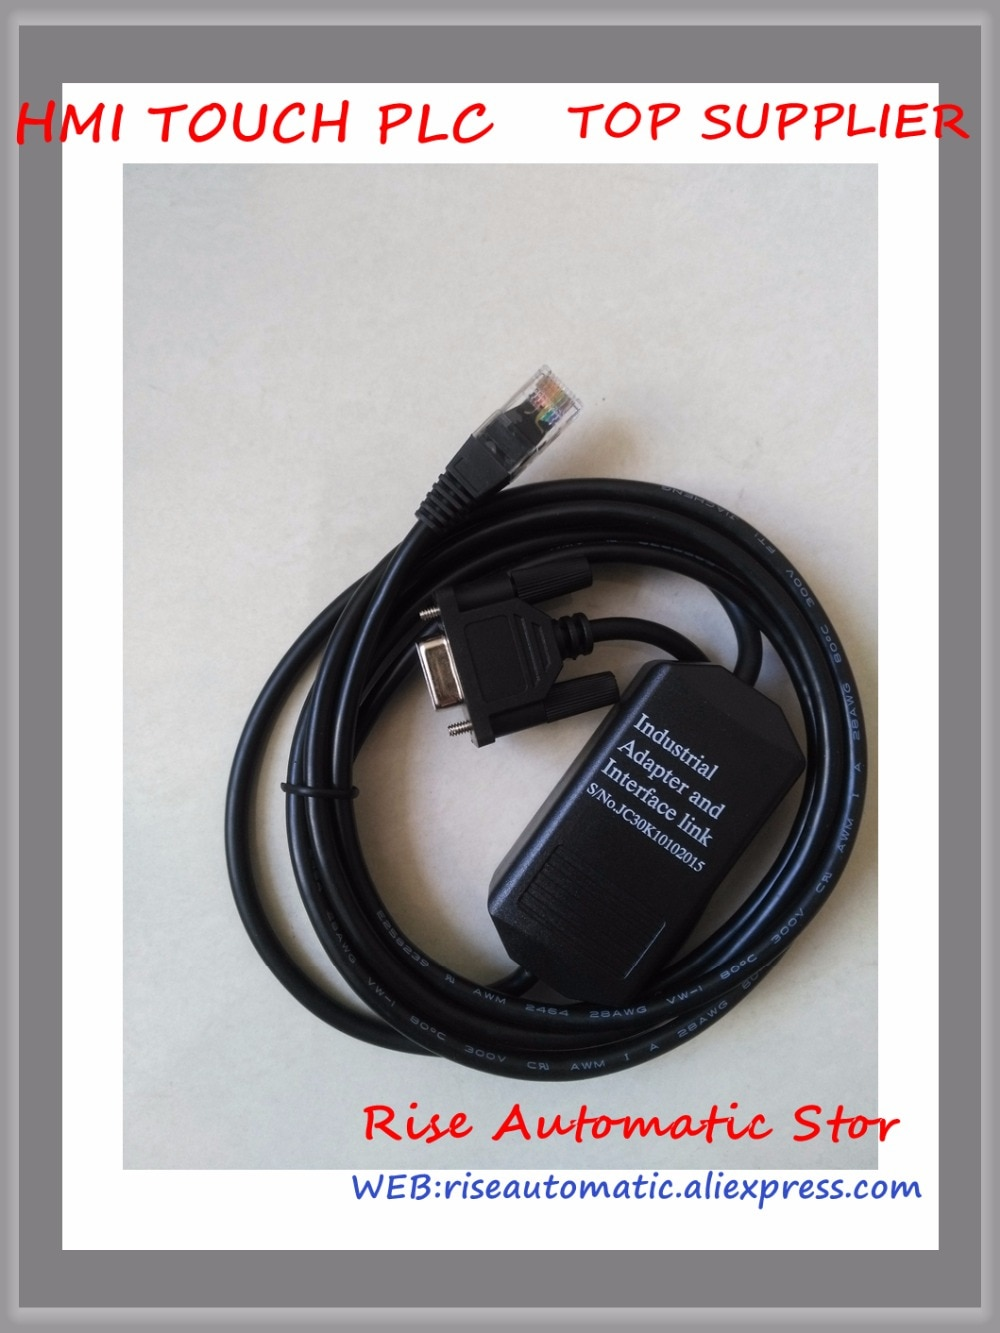 Adaptador de DH-485 1747-PIC RS232 para SLC5/01/02/05/03 Series PLC con indicador 2,5 m RJ45 entrega rápida